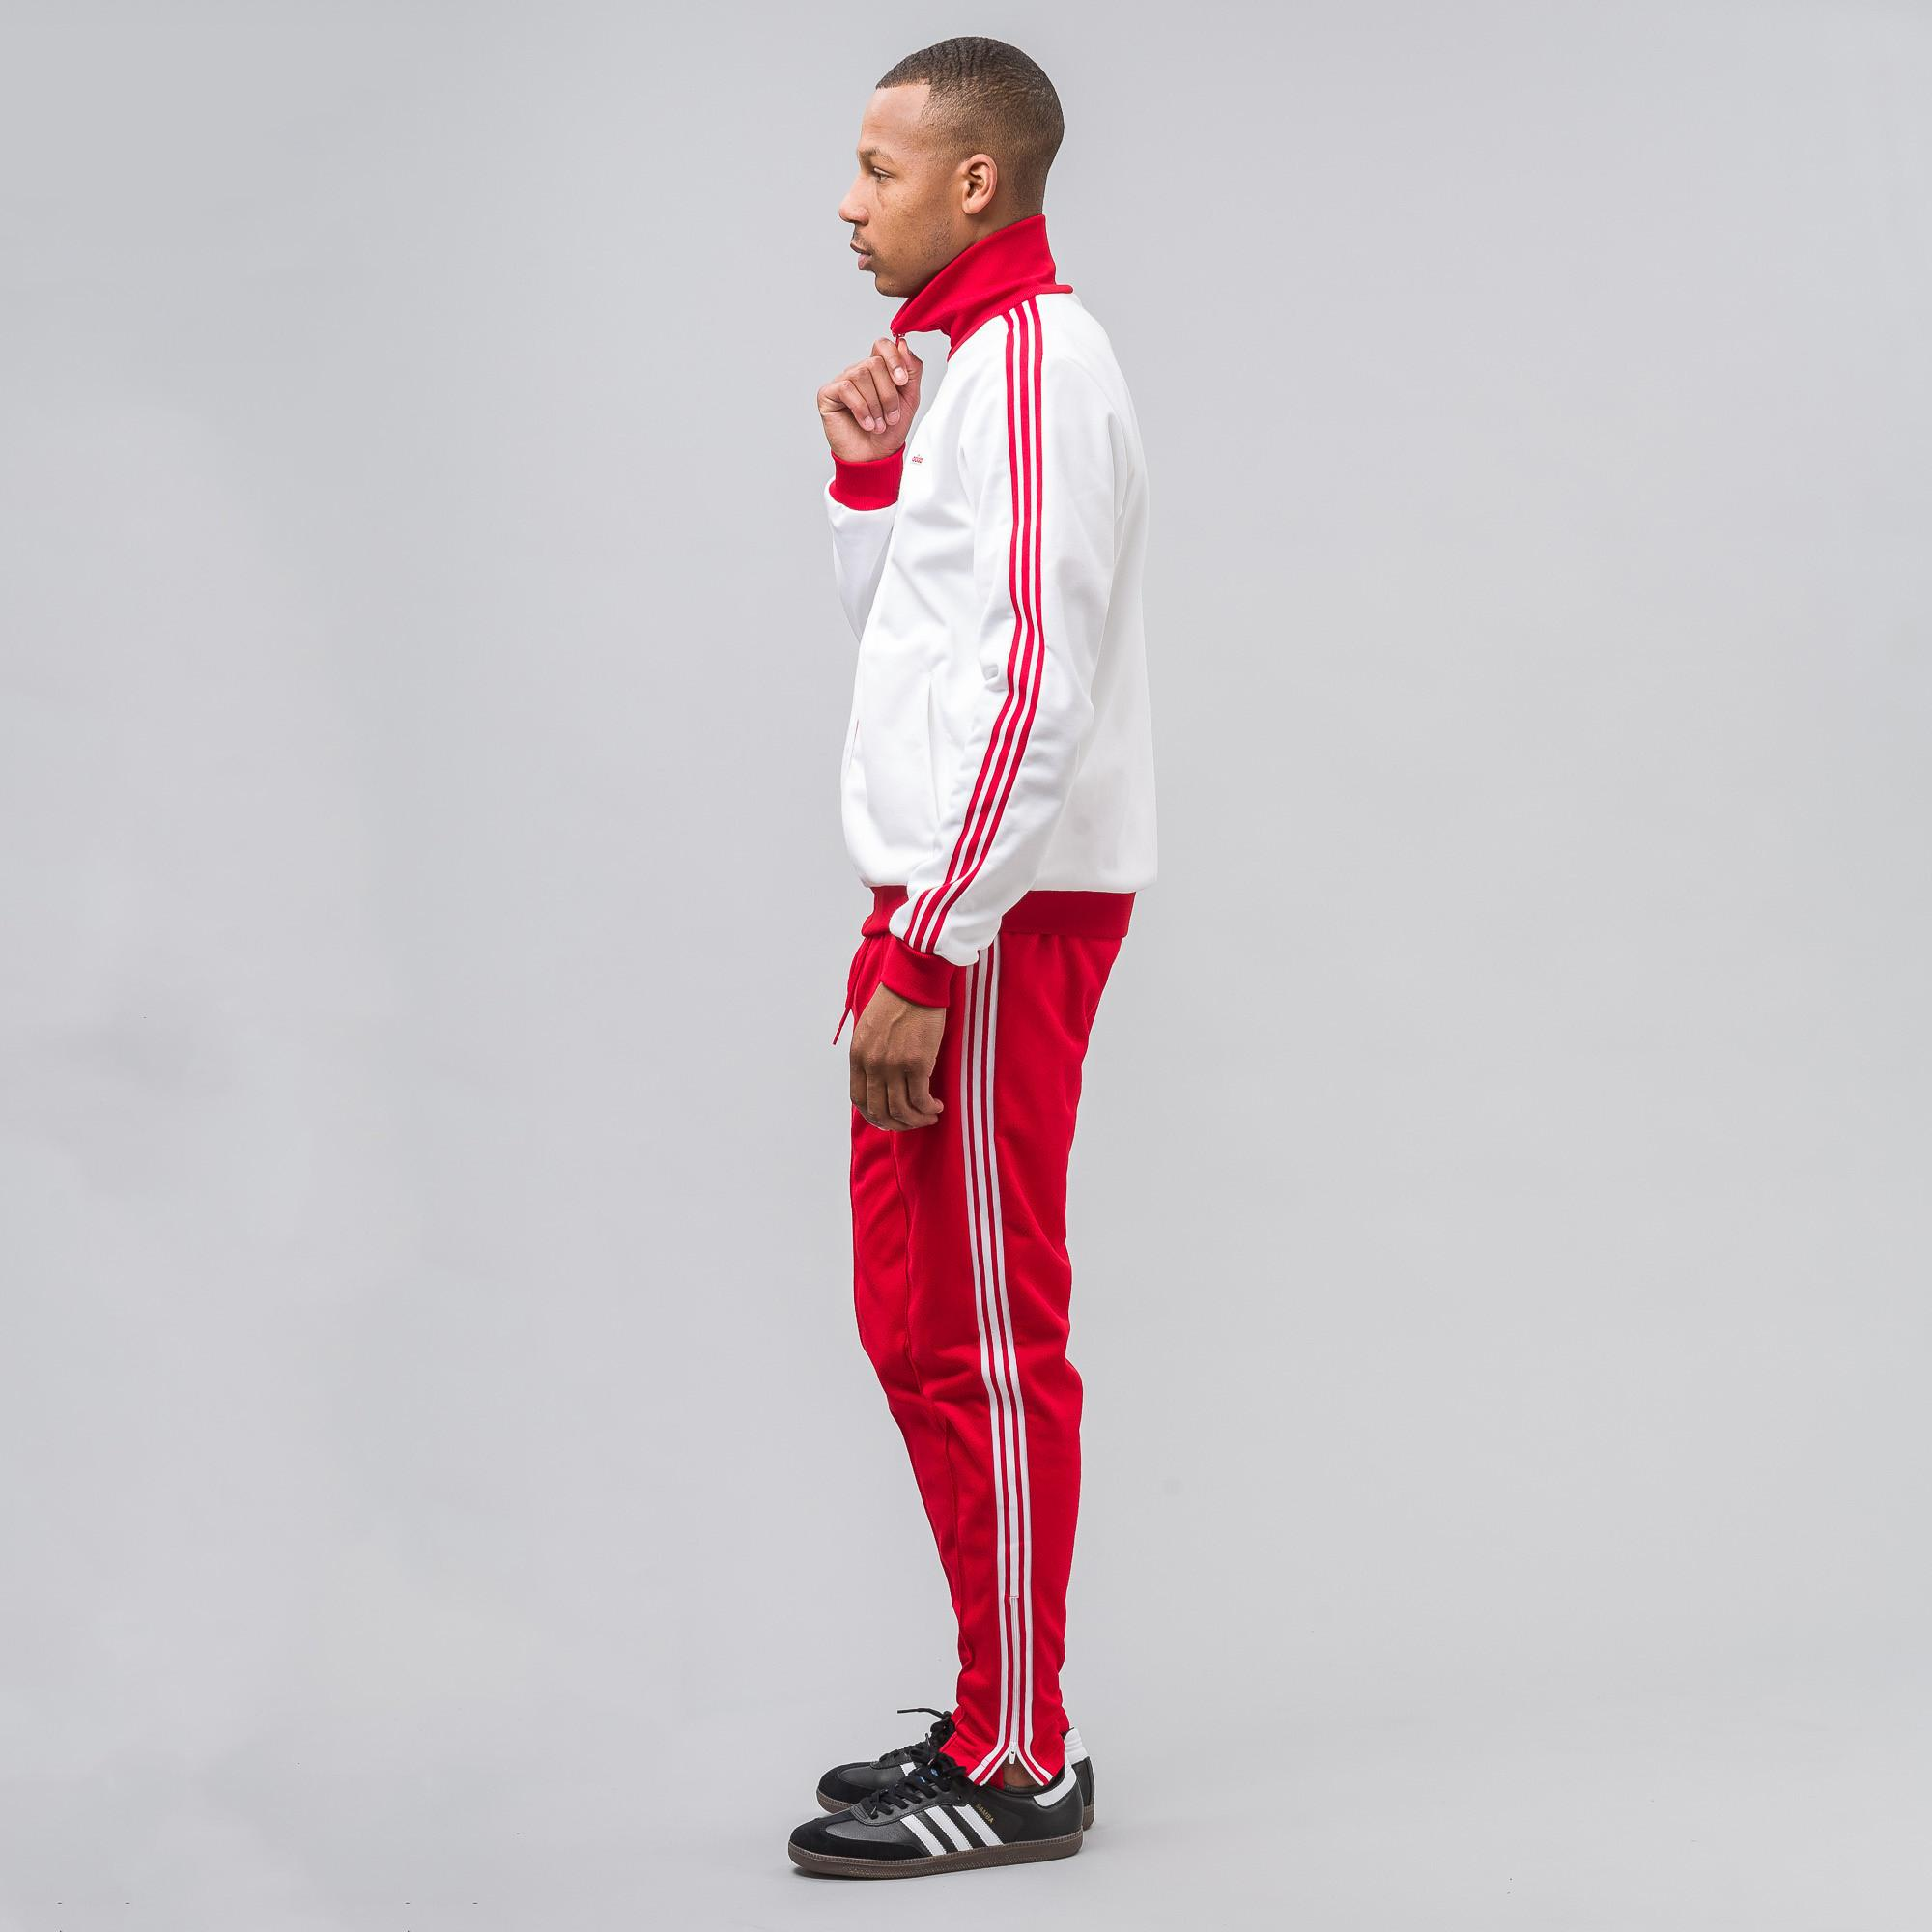 d06681780ce3 Lyst - adidas Originals Beckenbauer Mig Tracksuit in Red for Men